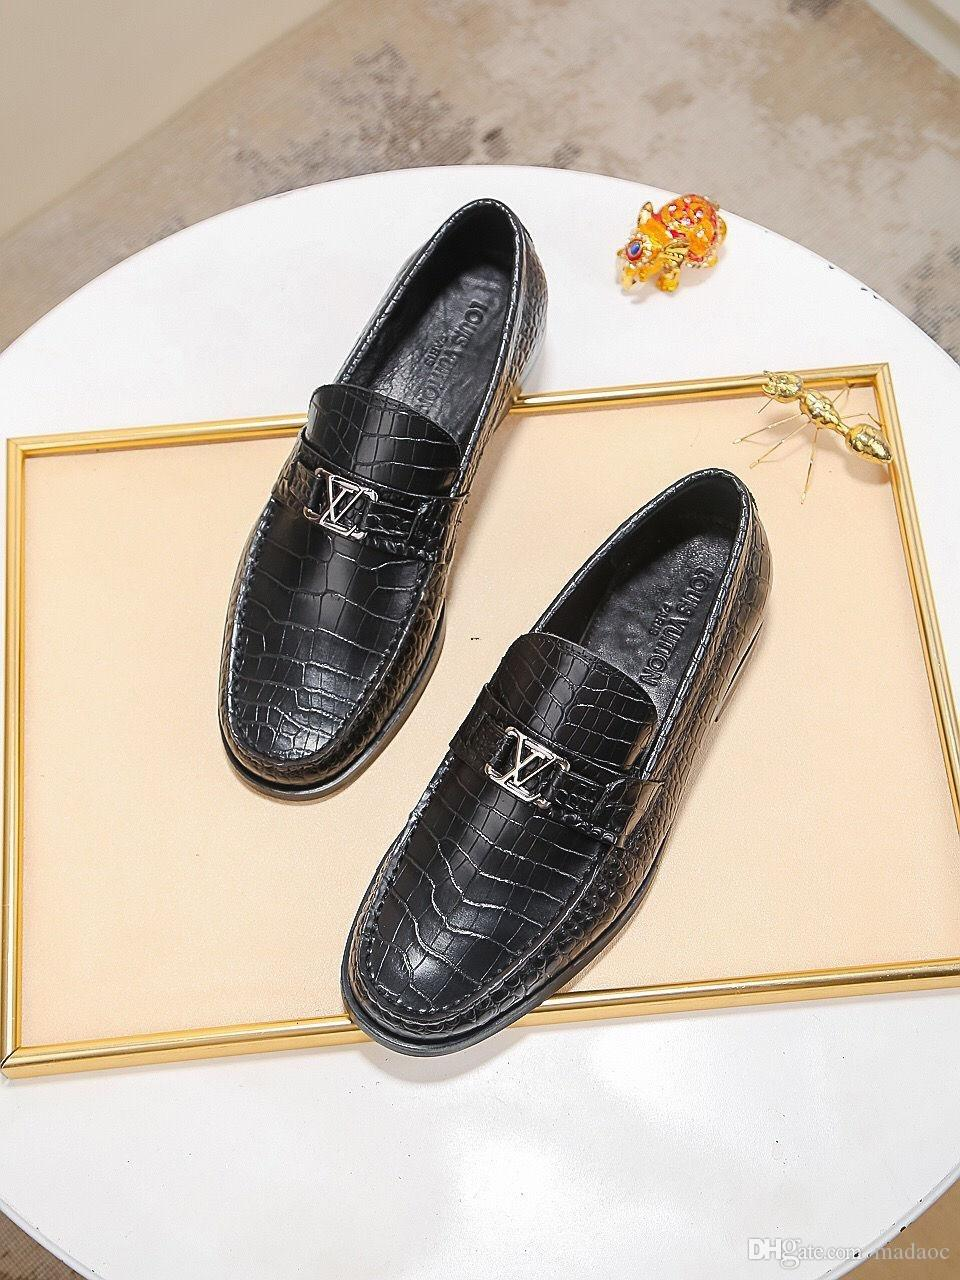 A8 marcas de moda parte inferior vermelha Sapatos Greggo Orlato plano de couro Oxford Shoes Mens Womens Andando Flats Luxury Wedding Party Loafers